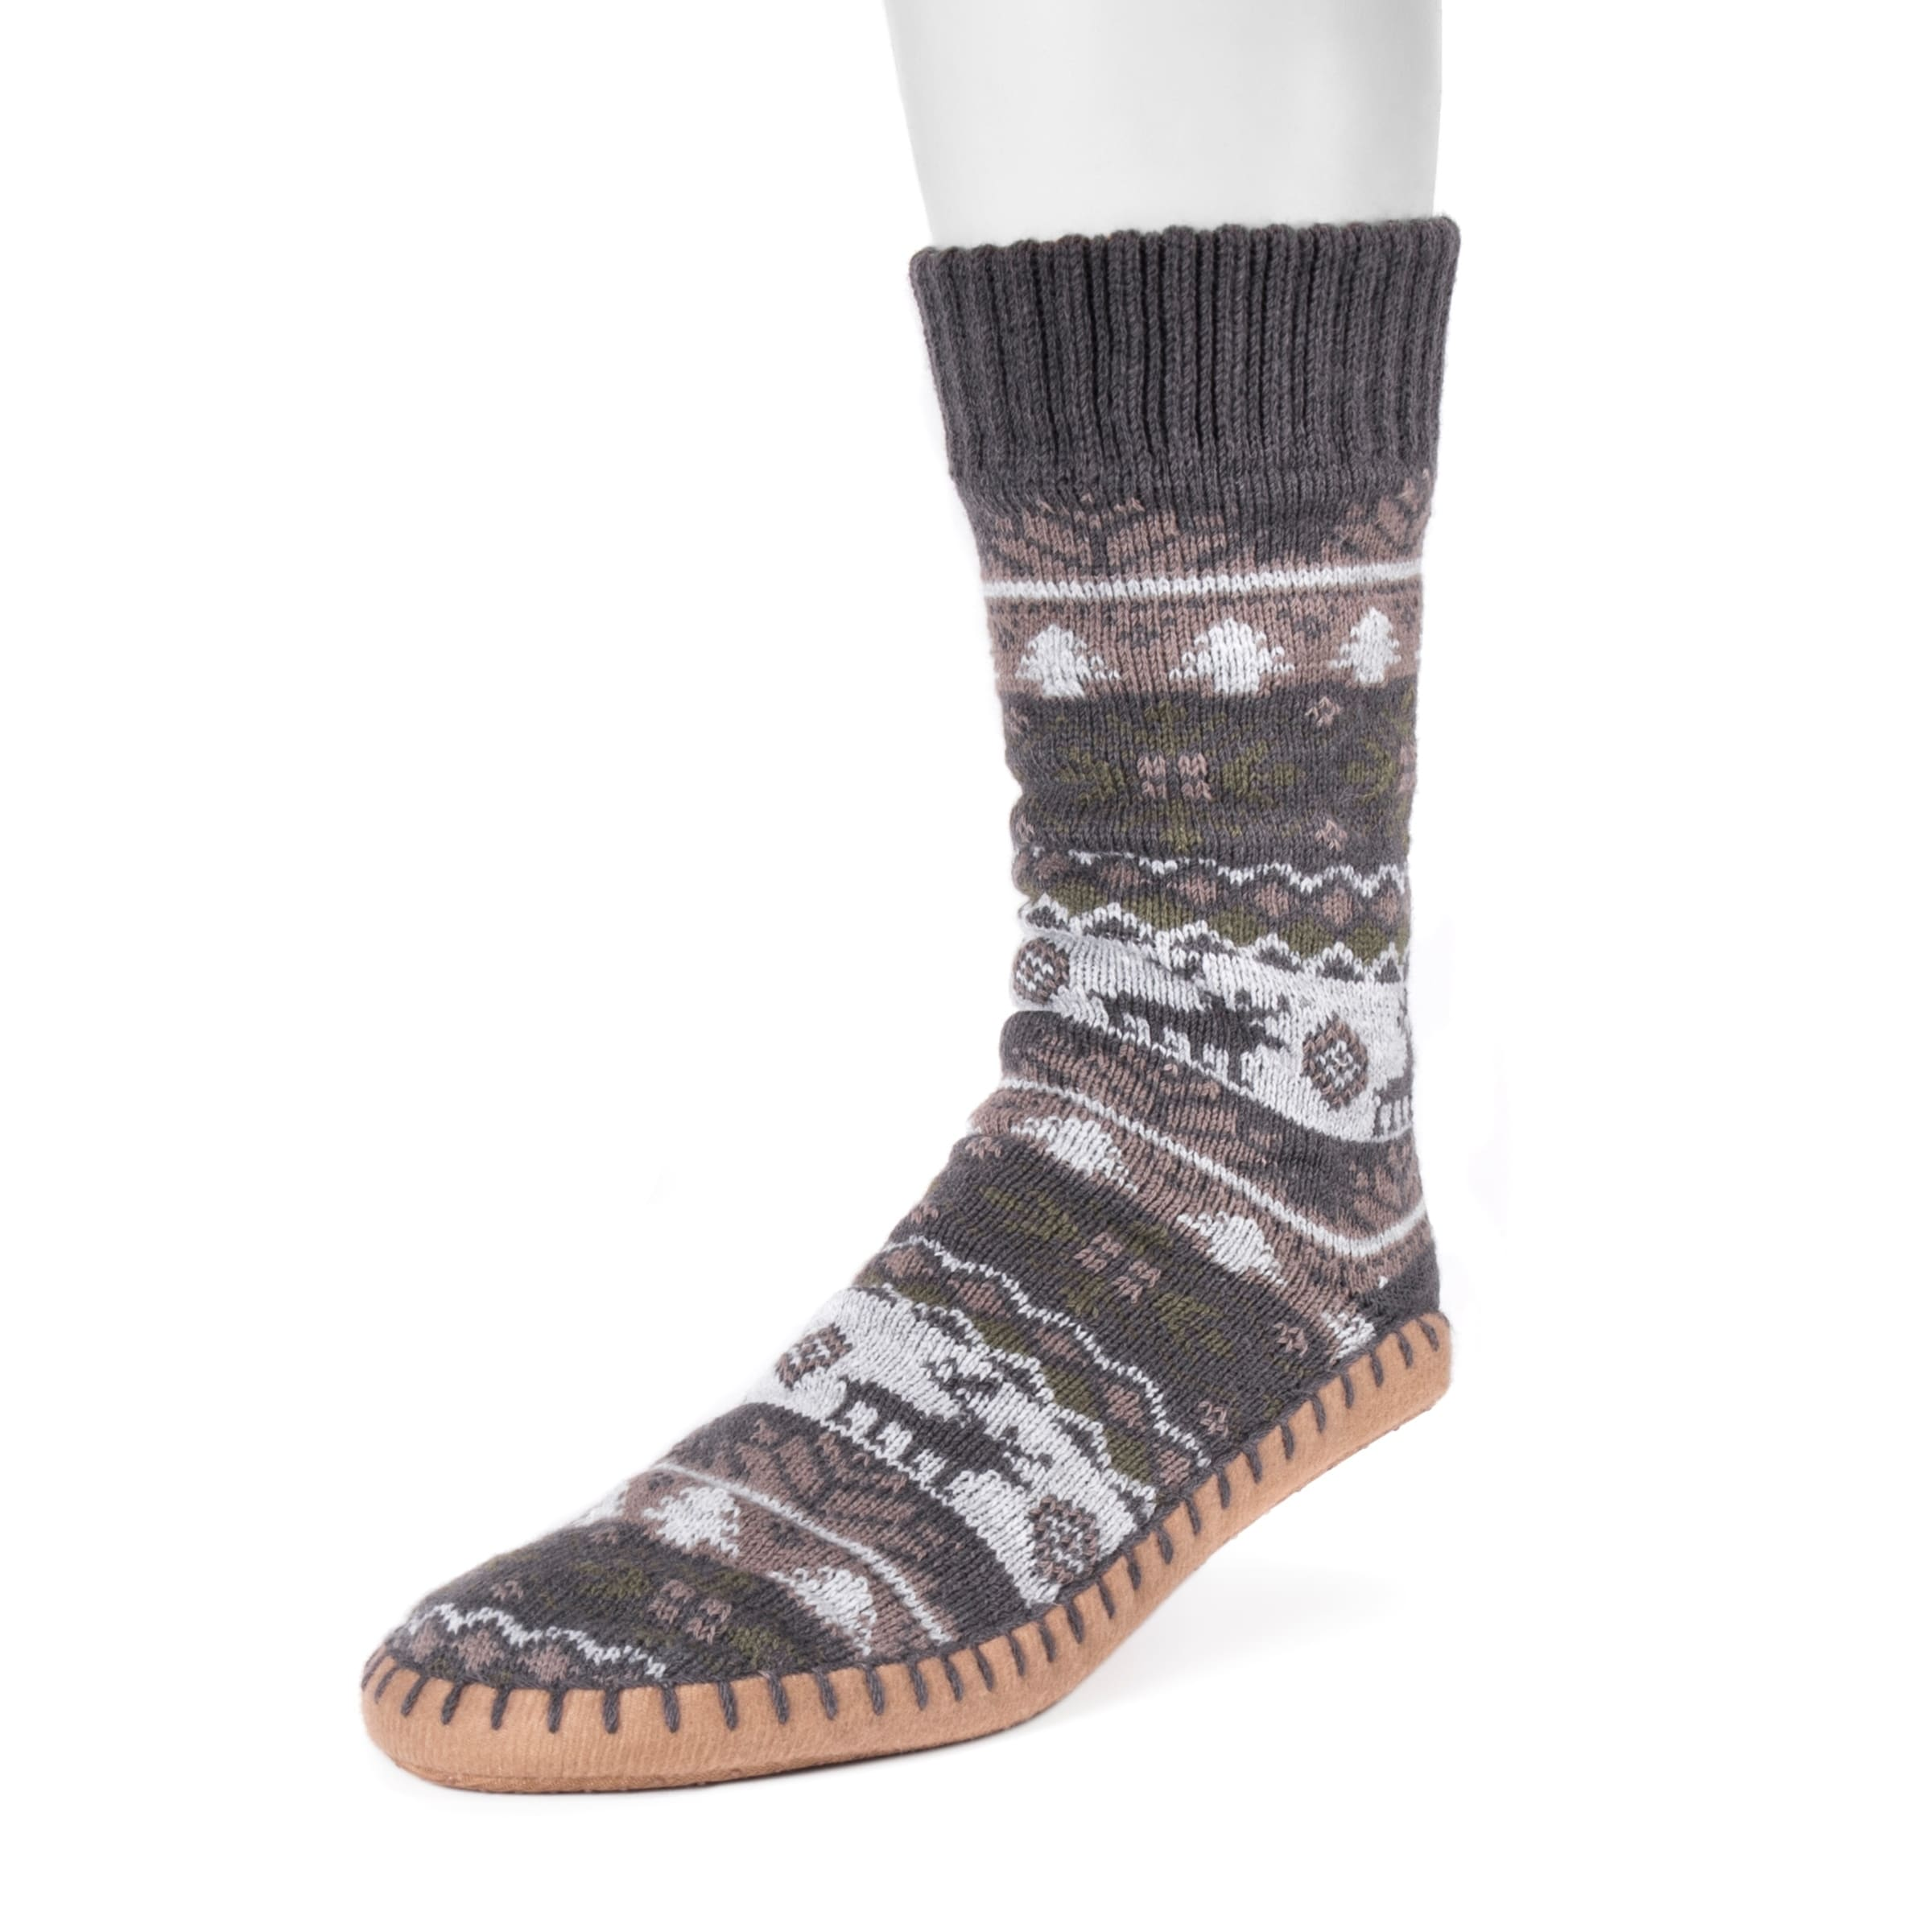 MUK LUKS Mens Slipper Socks sareg.com